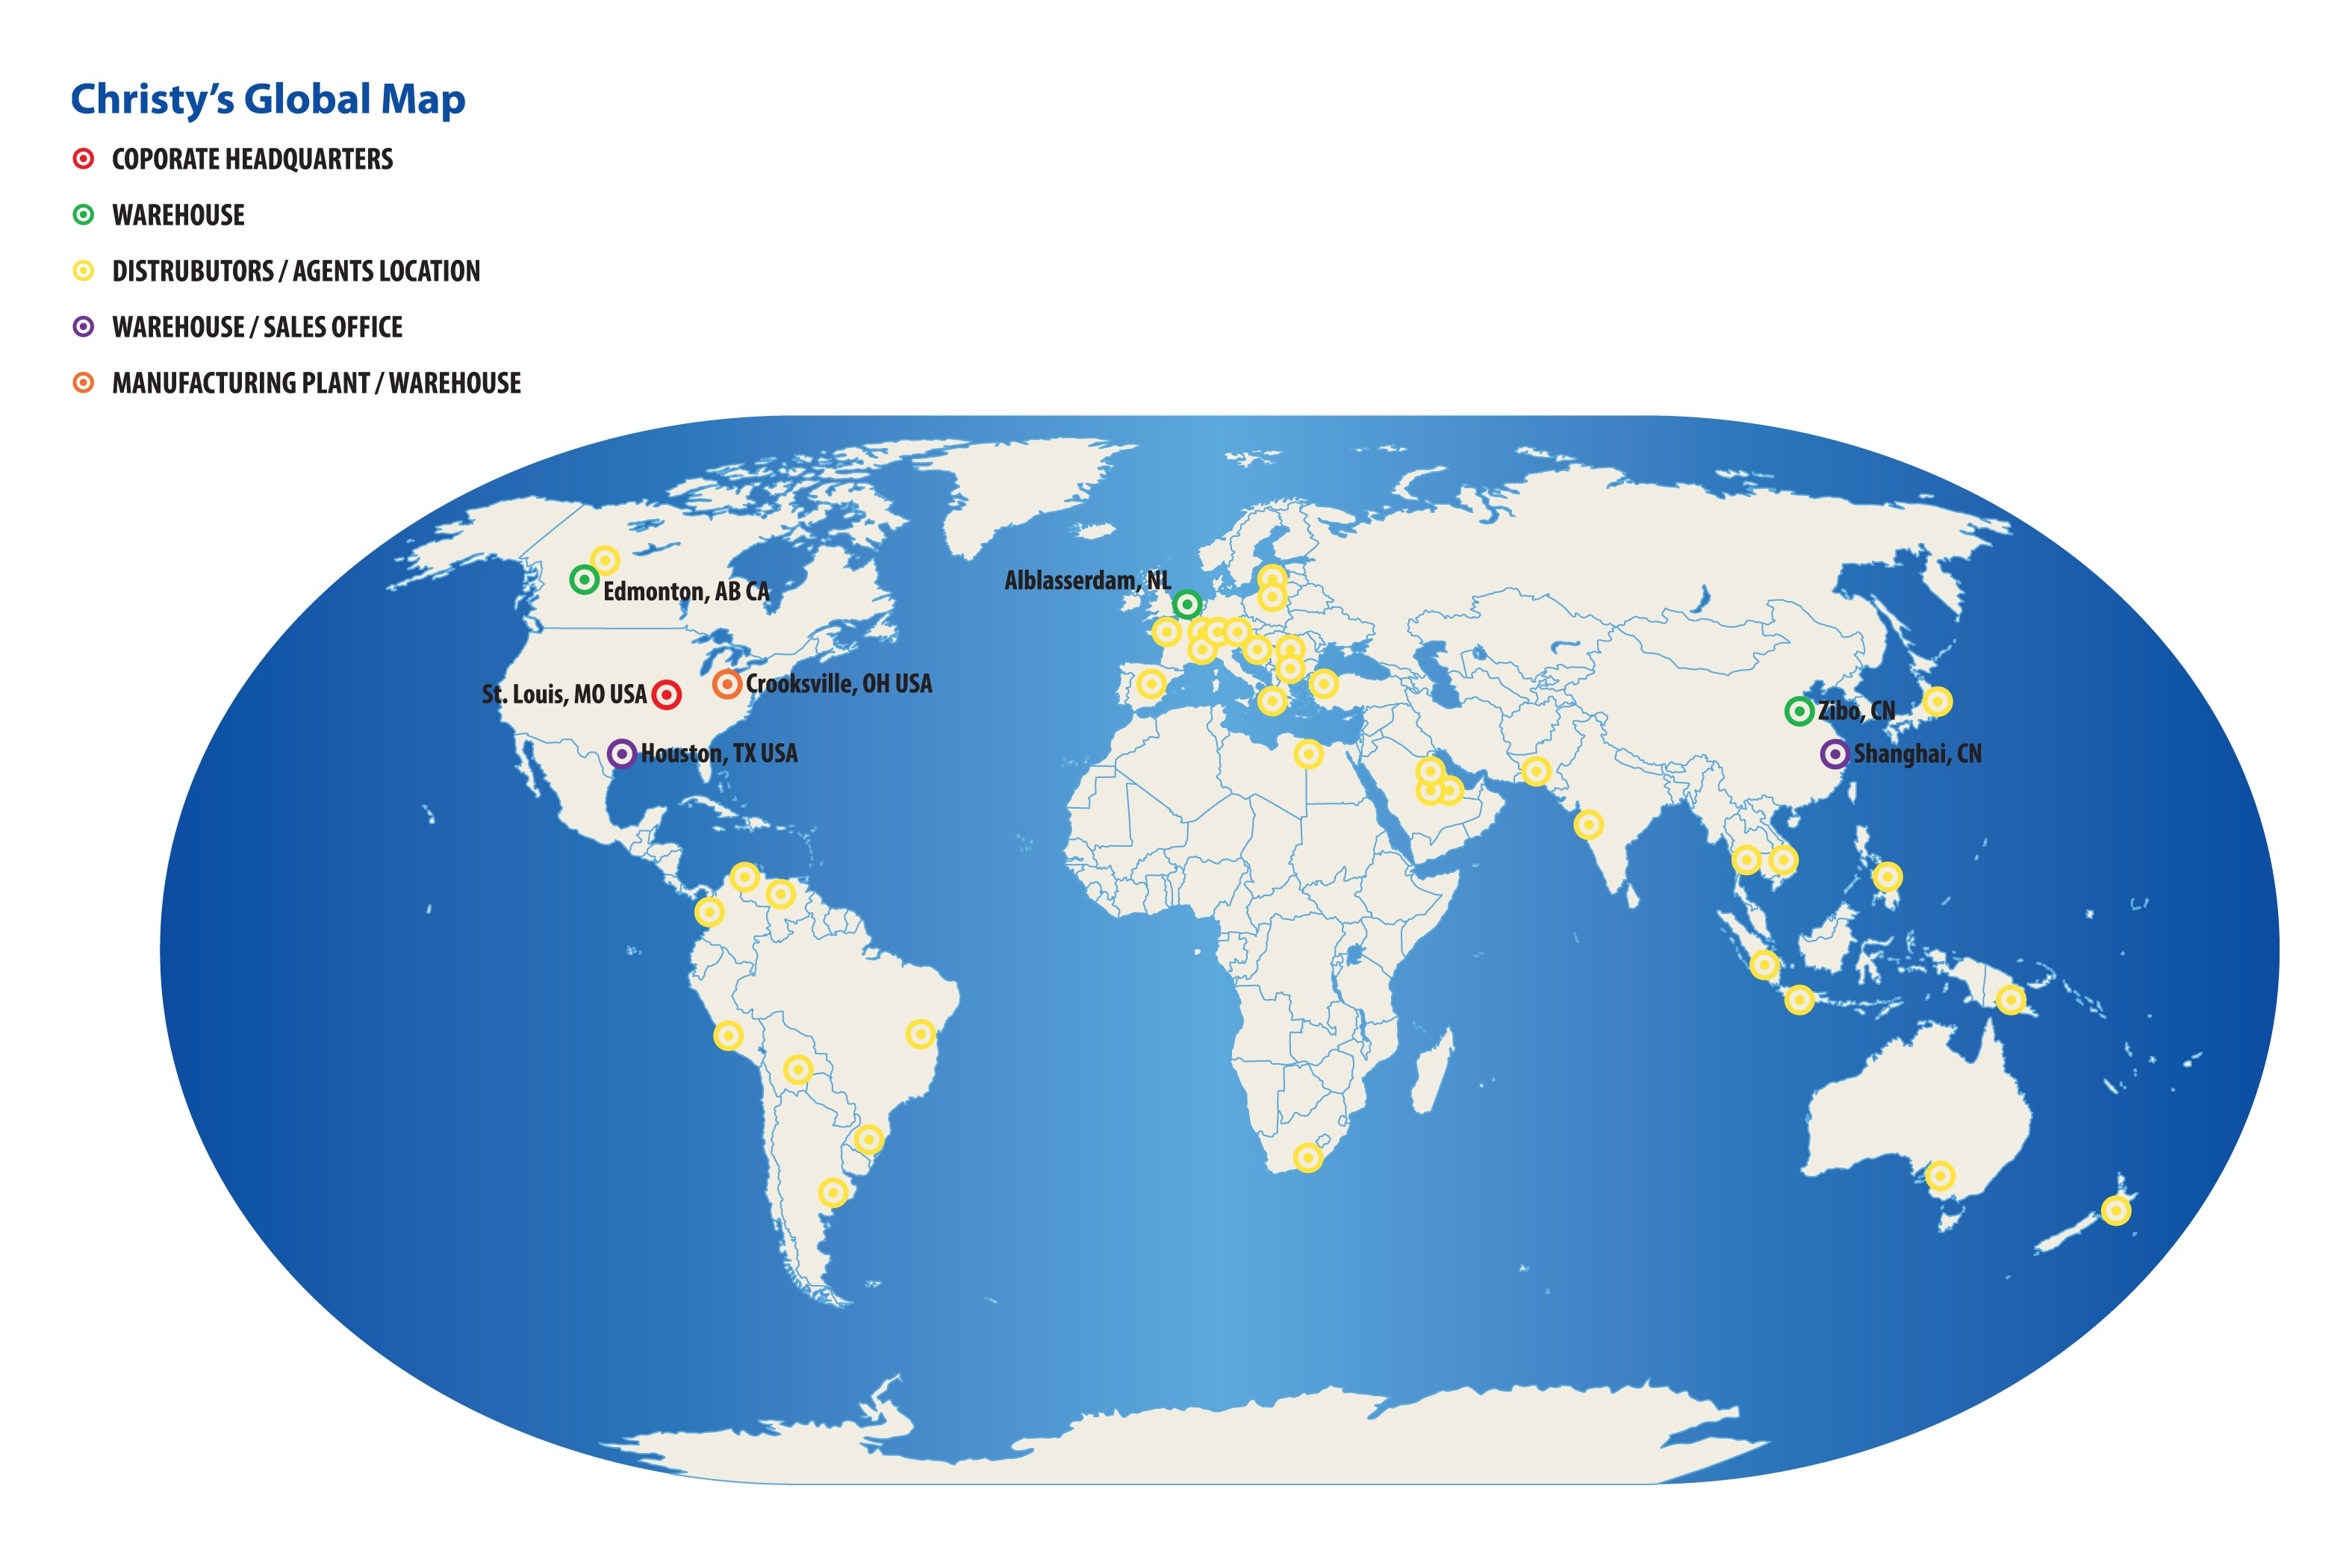 Christy_Locations_Map-1.jpg